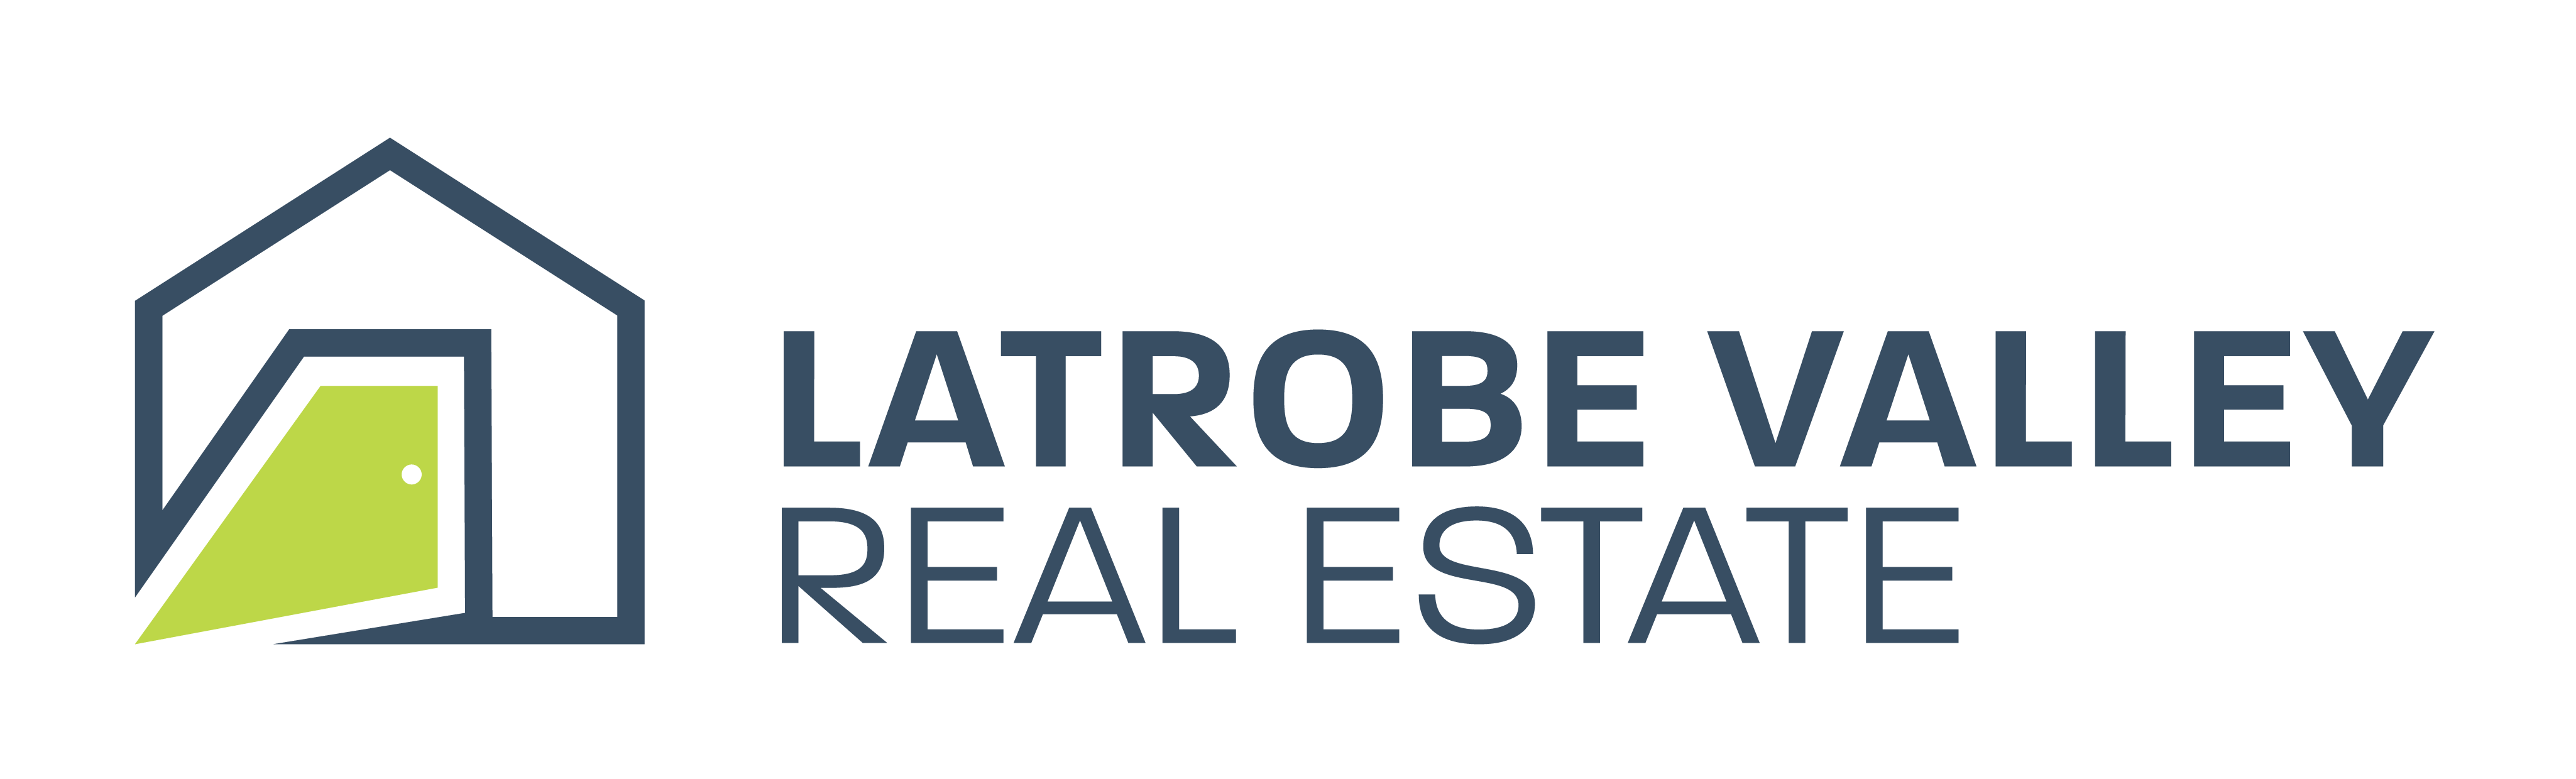 Latrobe Valley Real Estate